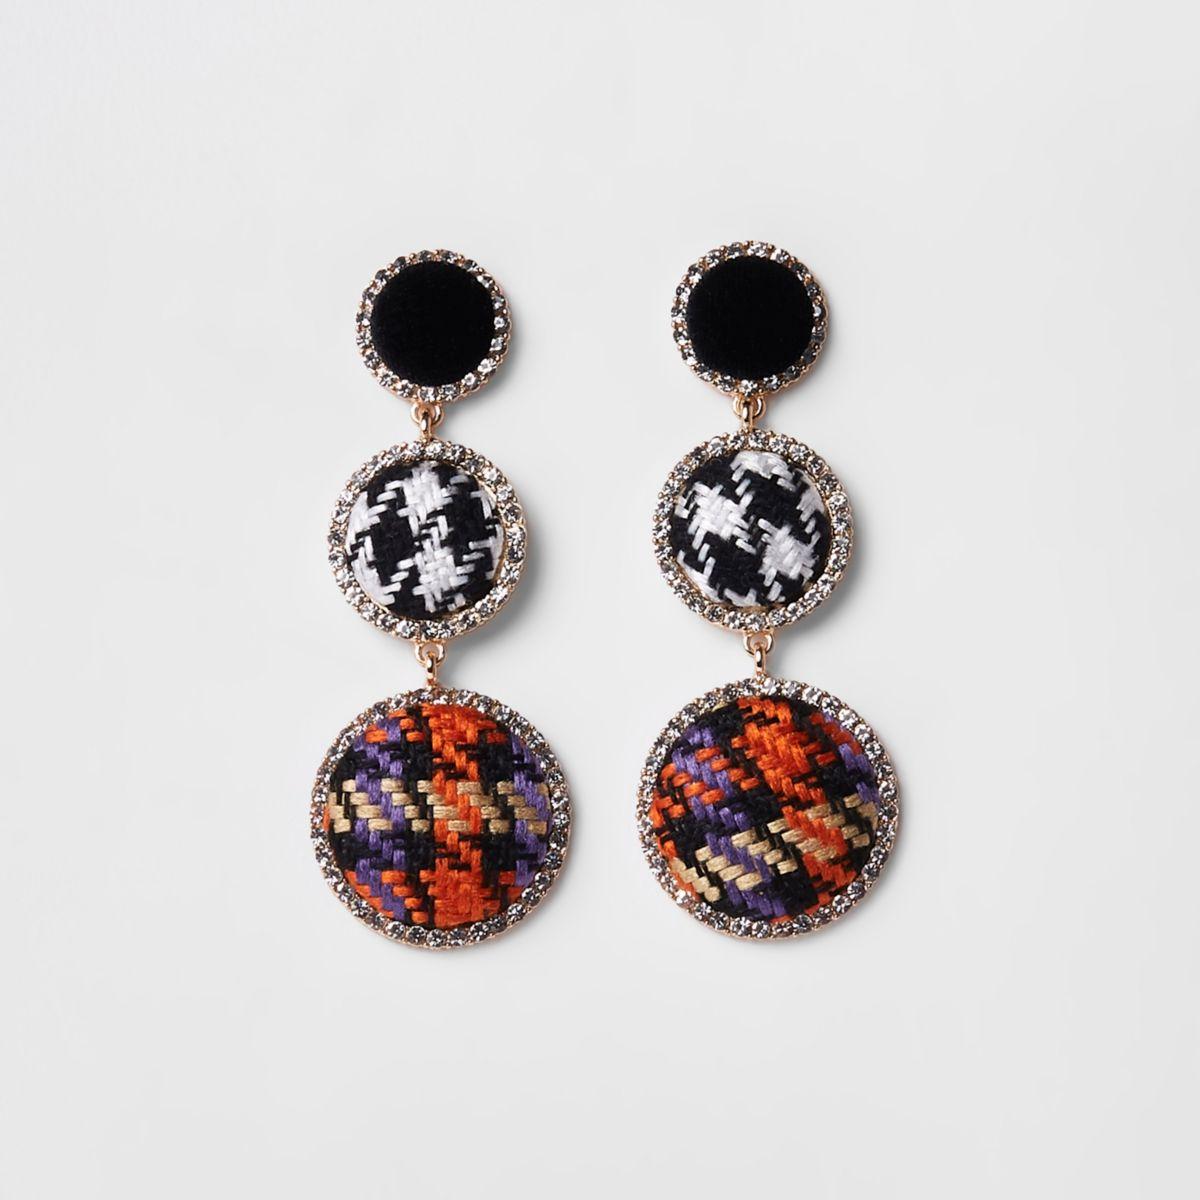 Black check rhinestone boucle drop earrings